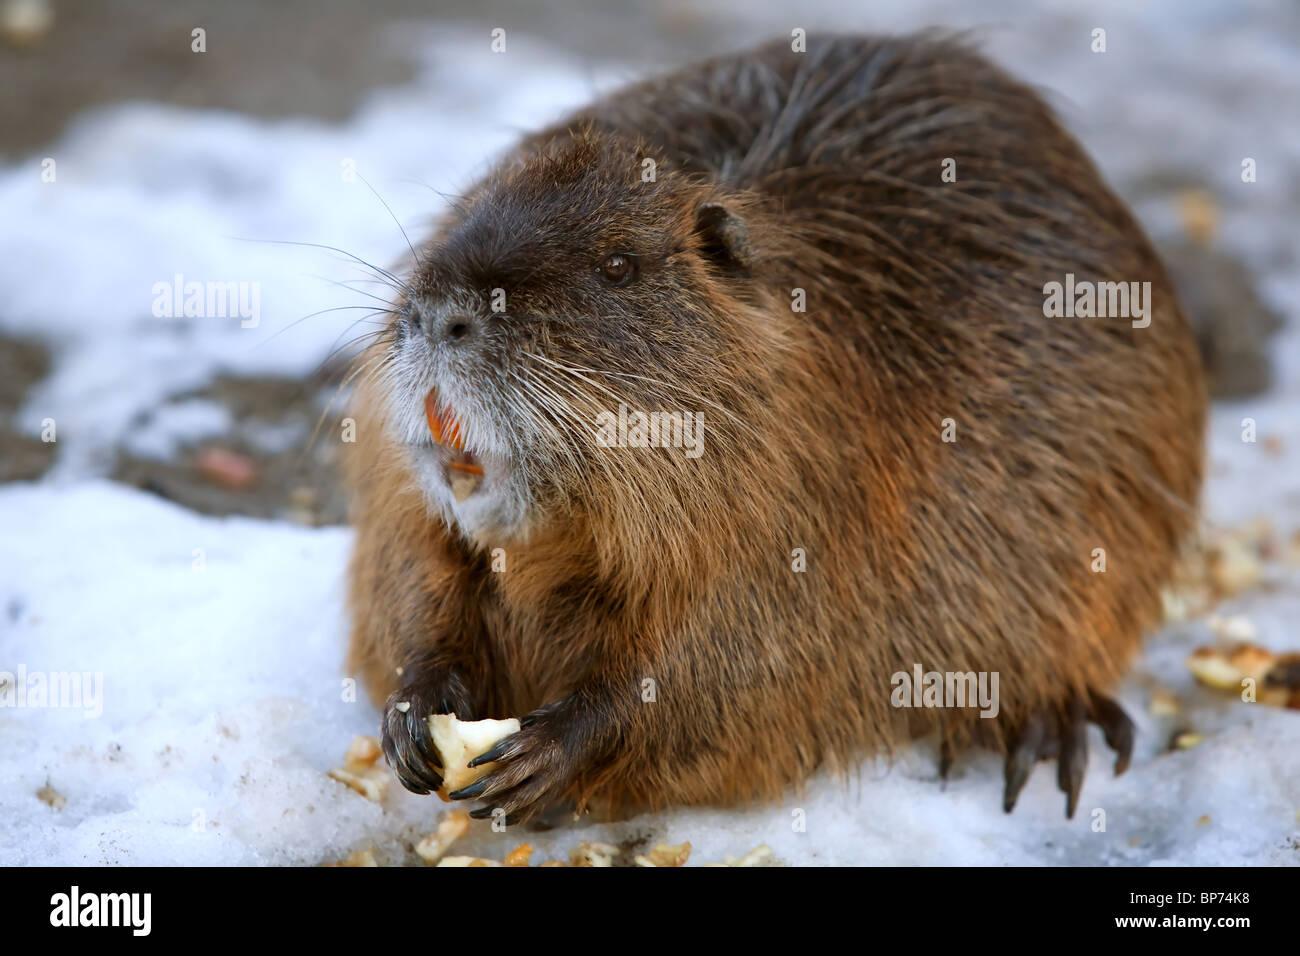 Mature beaver